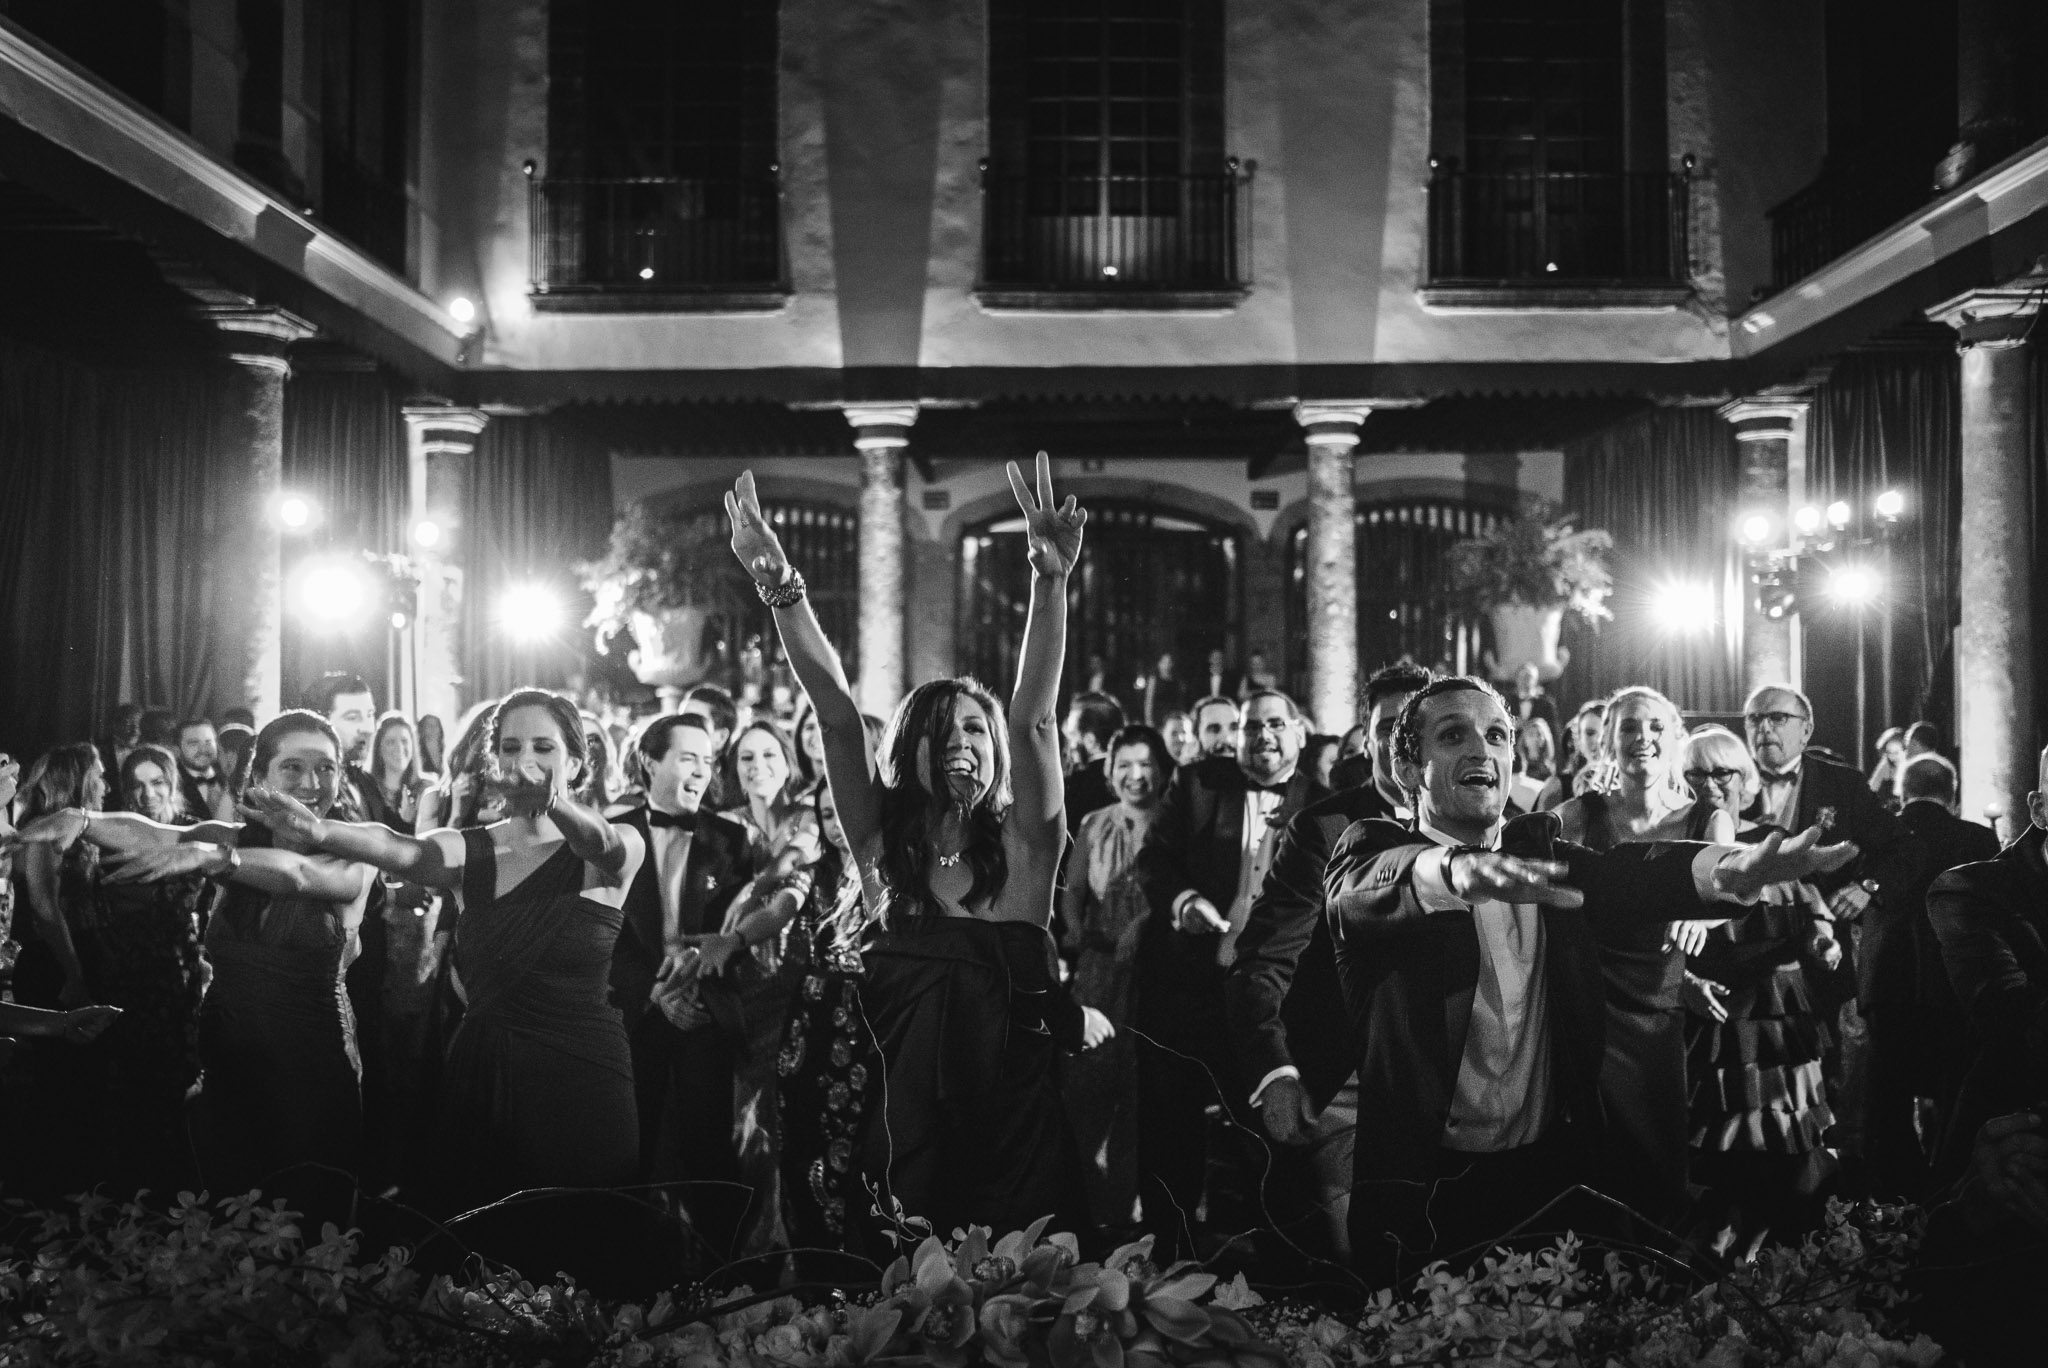 ©www.mauriziosolisbroca.com-20161002maurizio-solis-broca-mexico-canada-wedding-photographer20161002DSC05583-Edit.jpg